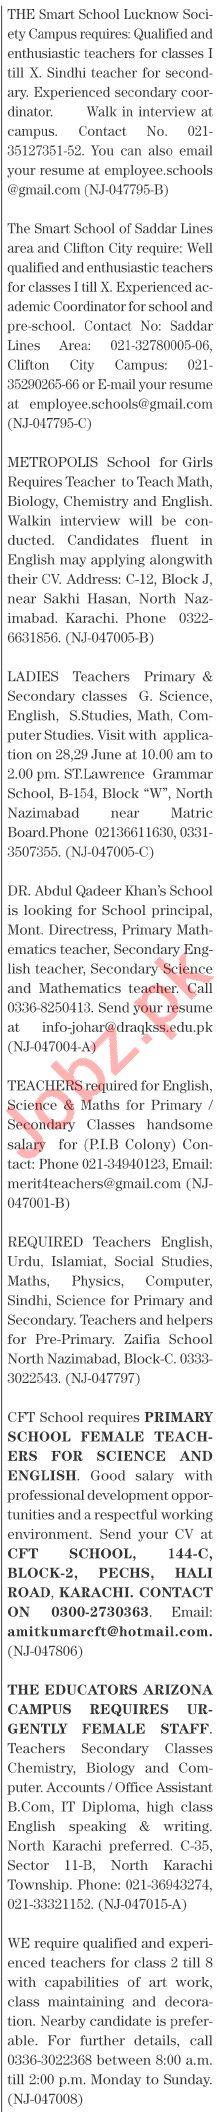 The News Sunday Classified Ads 27 June 2021 Teaching Staff